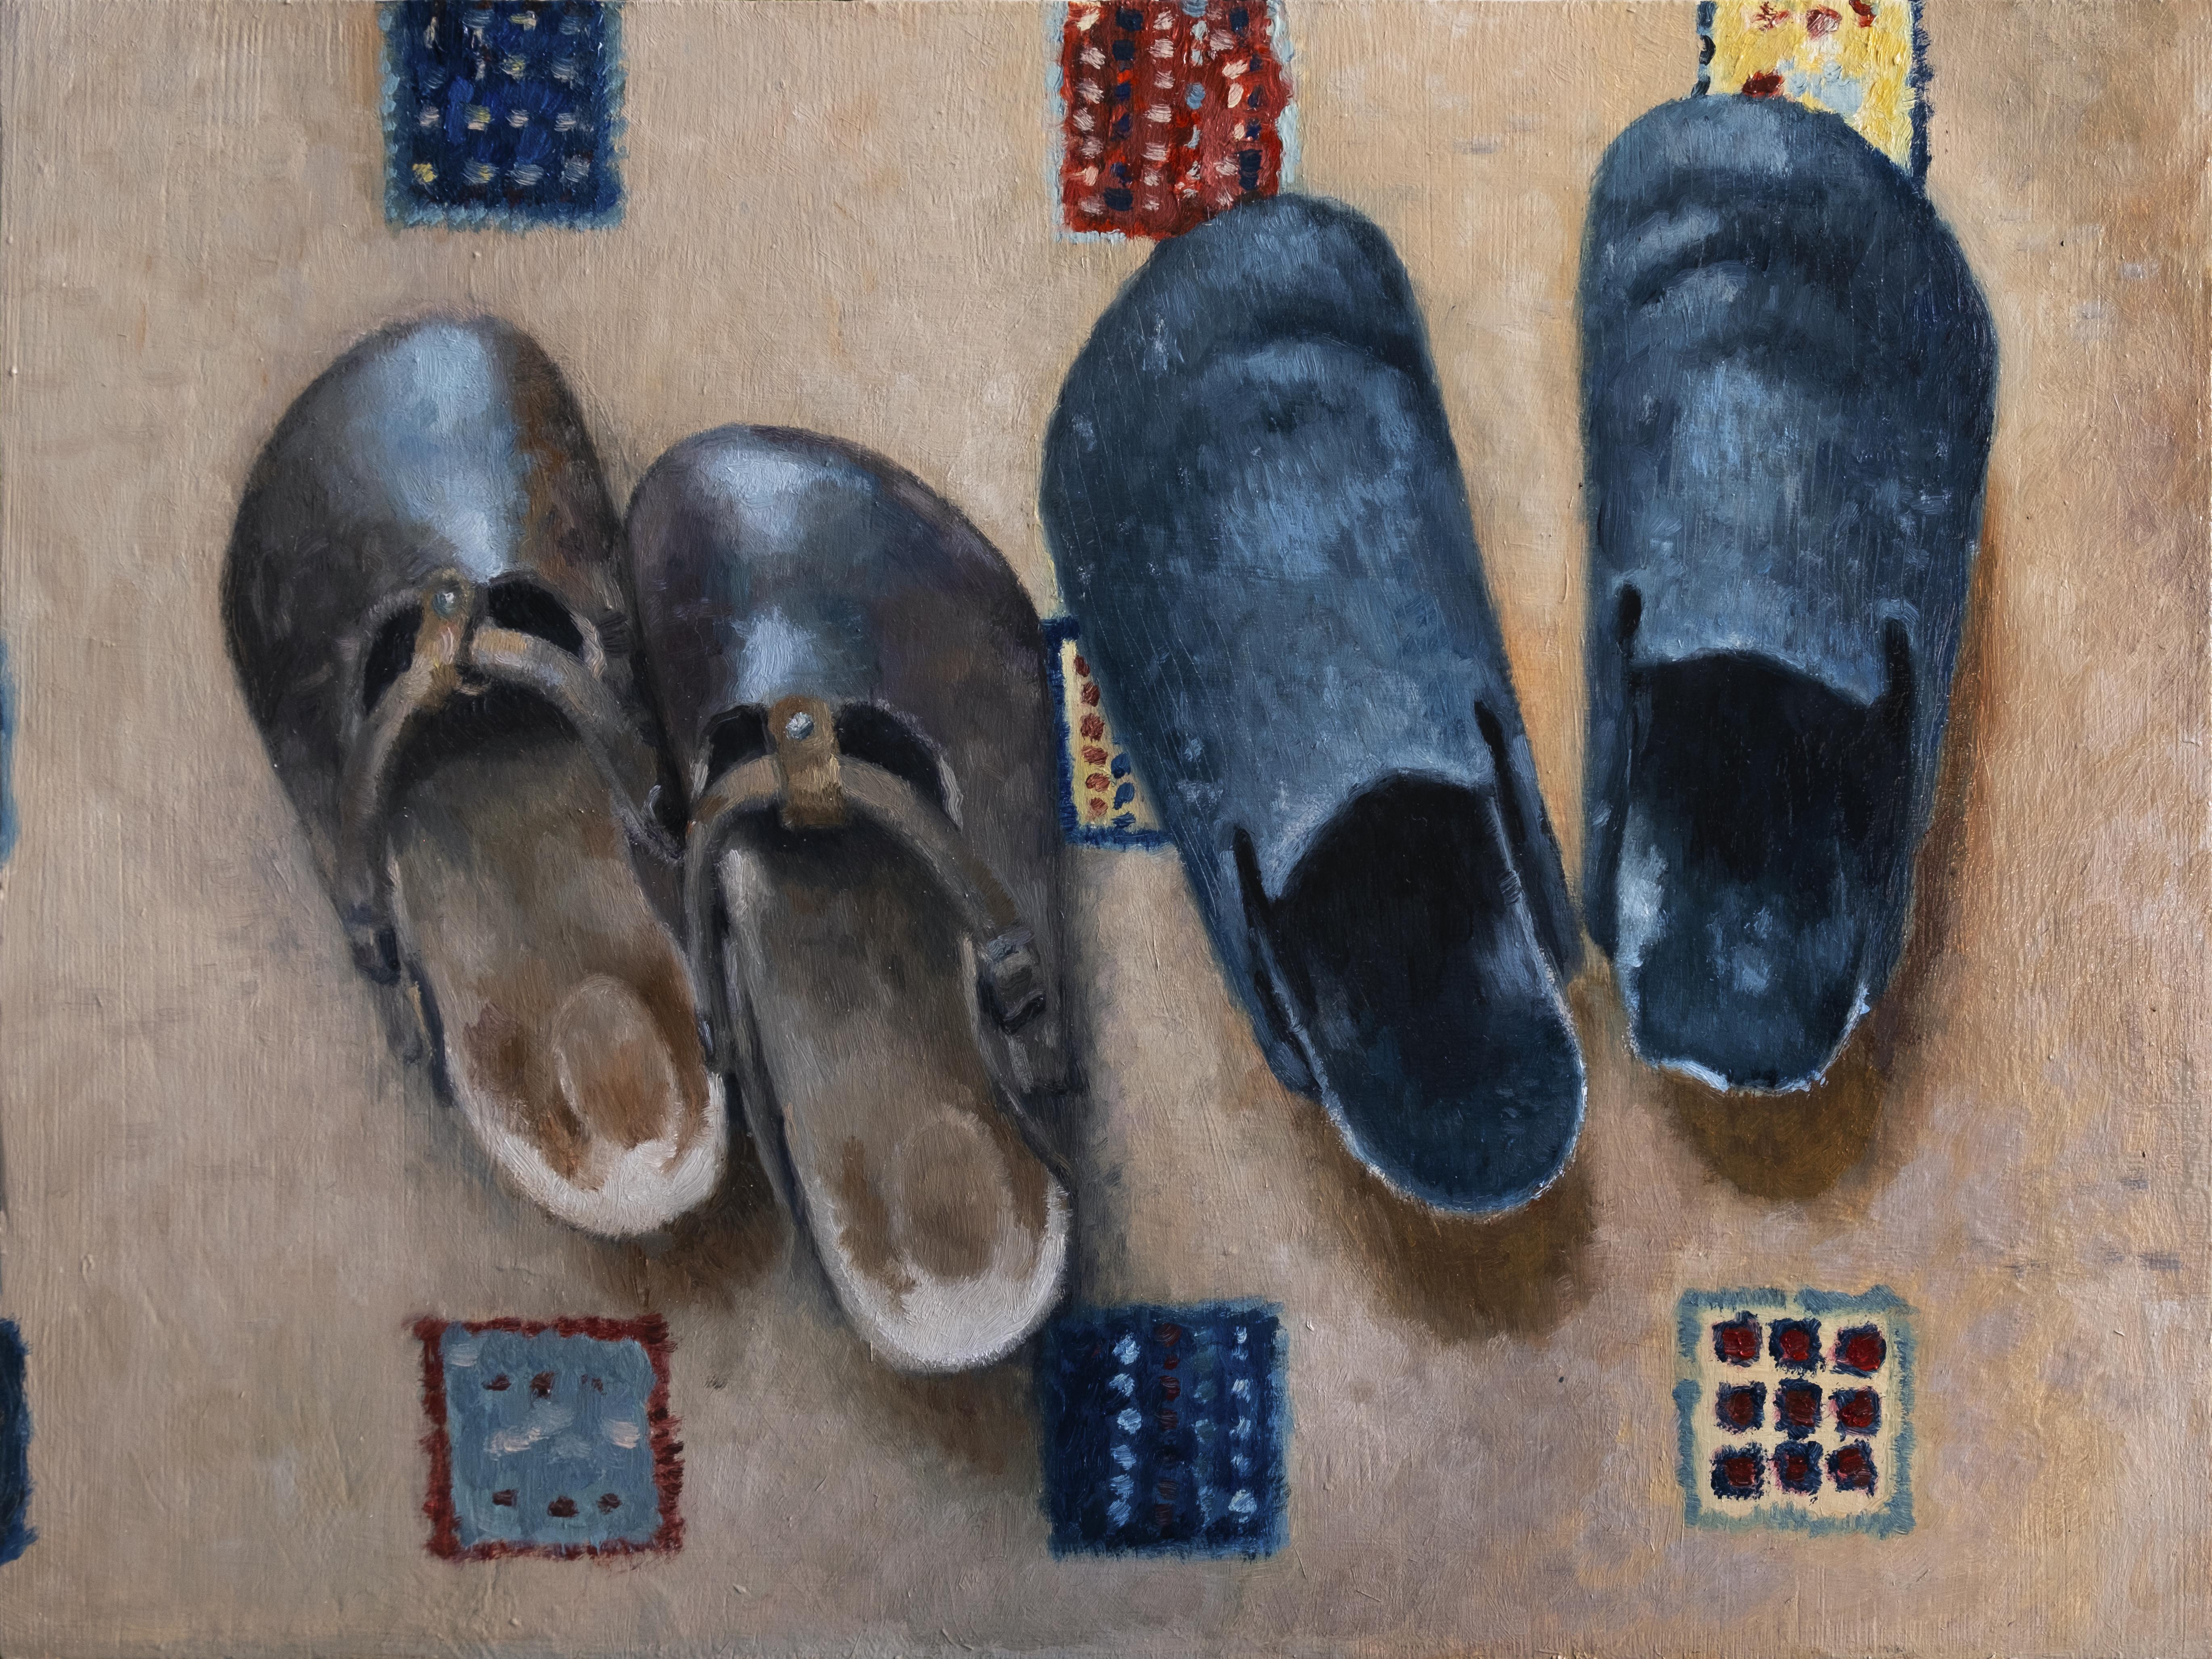 Anna Calleja, Comfort Zone, oil on panel, 30x40cm, 2020